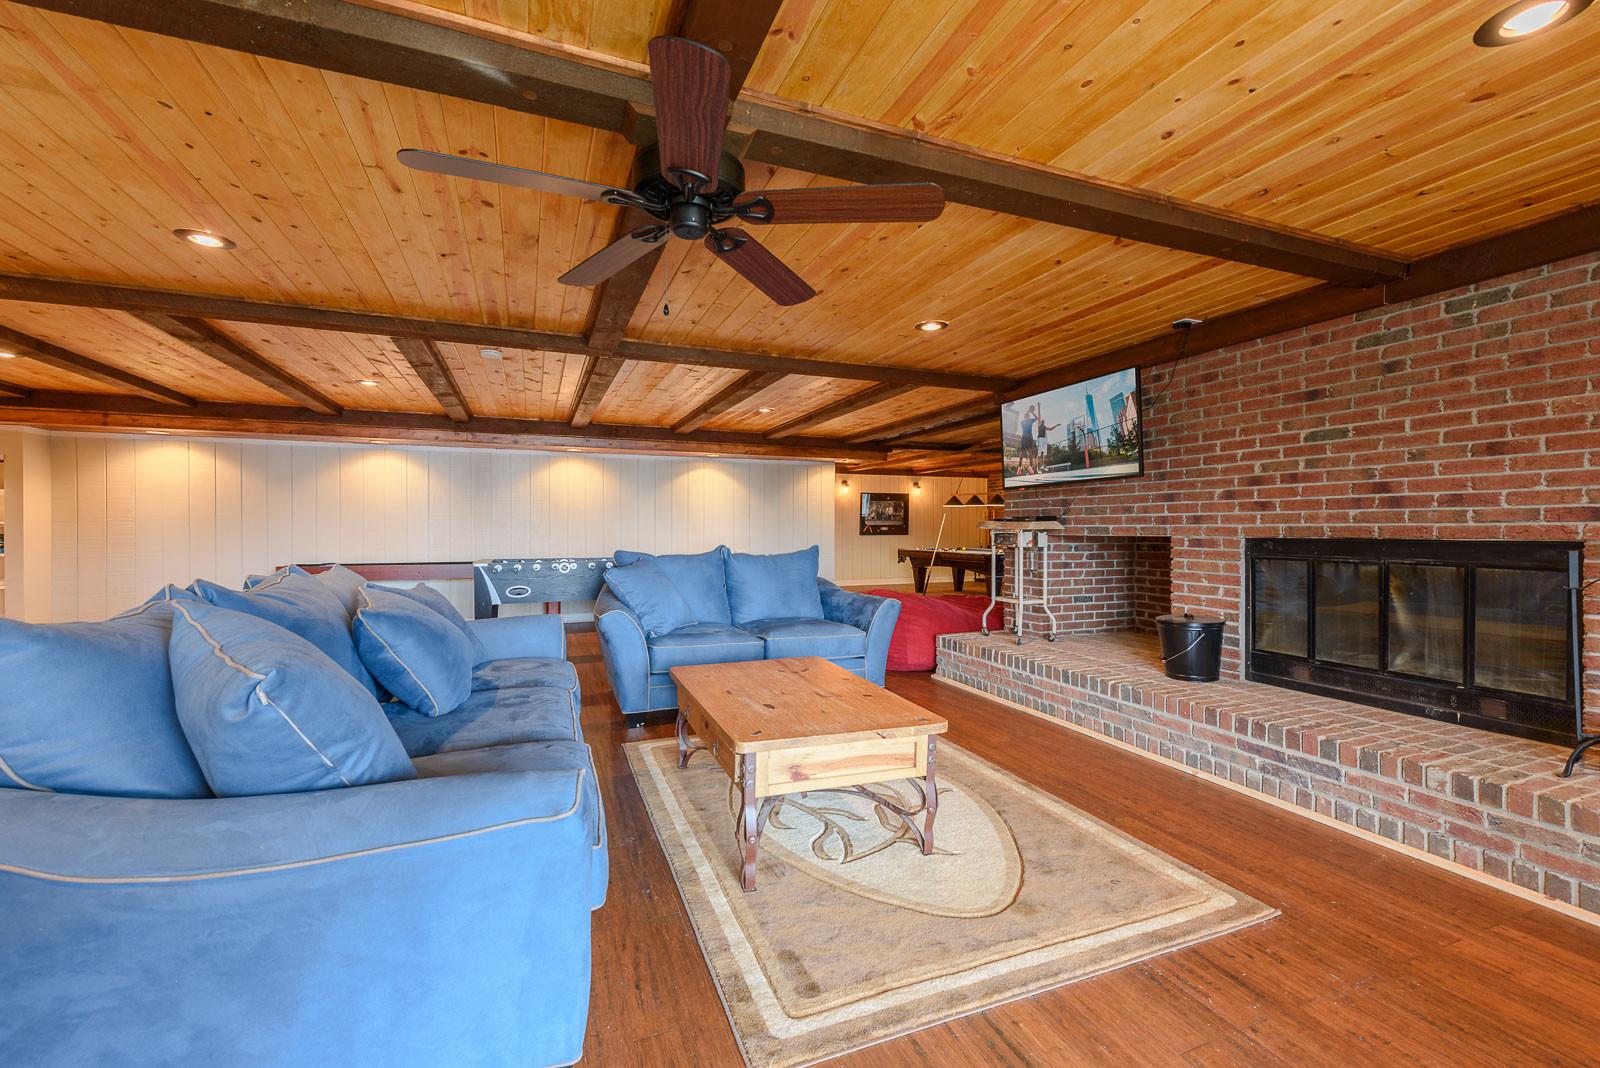 hardwood flooring boone nc of appalachian mountain lodge mountain family lodge boone family in 150139678